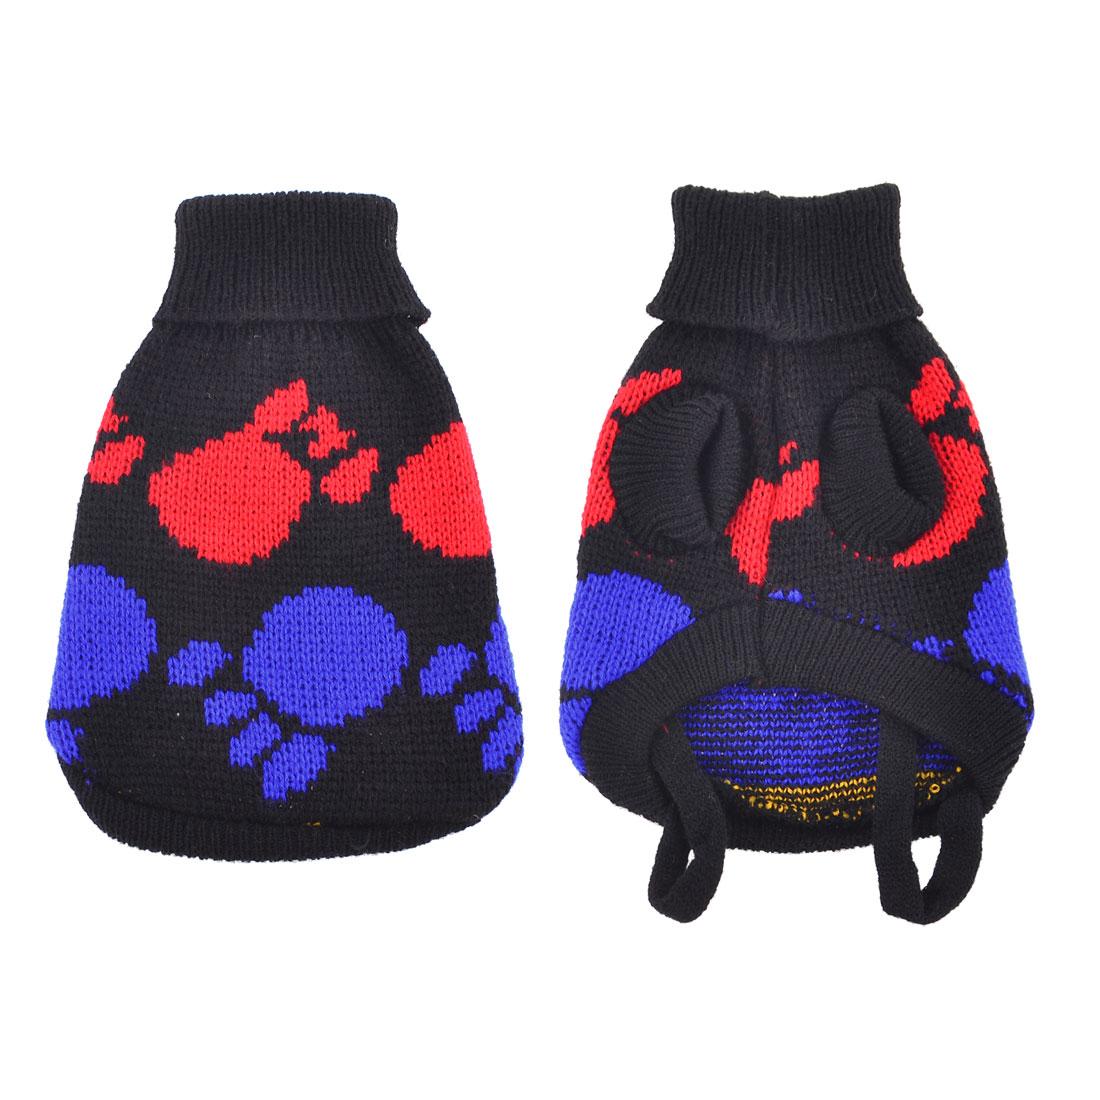 Winter Black Blue Knitting Sleeves Paw Pattern Pet Dog Puppy Sweater Apparel XS